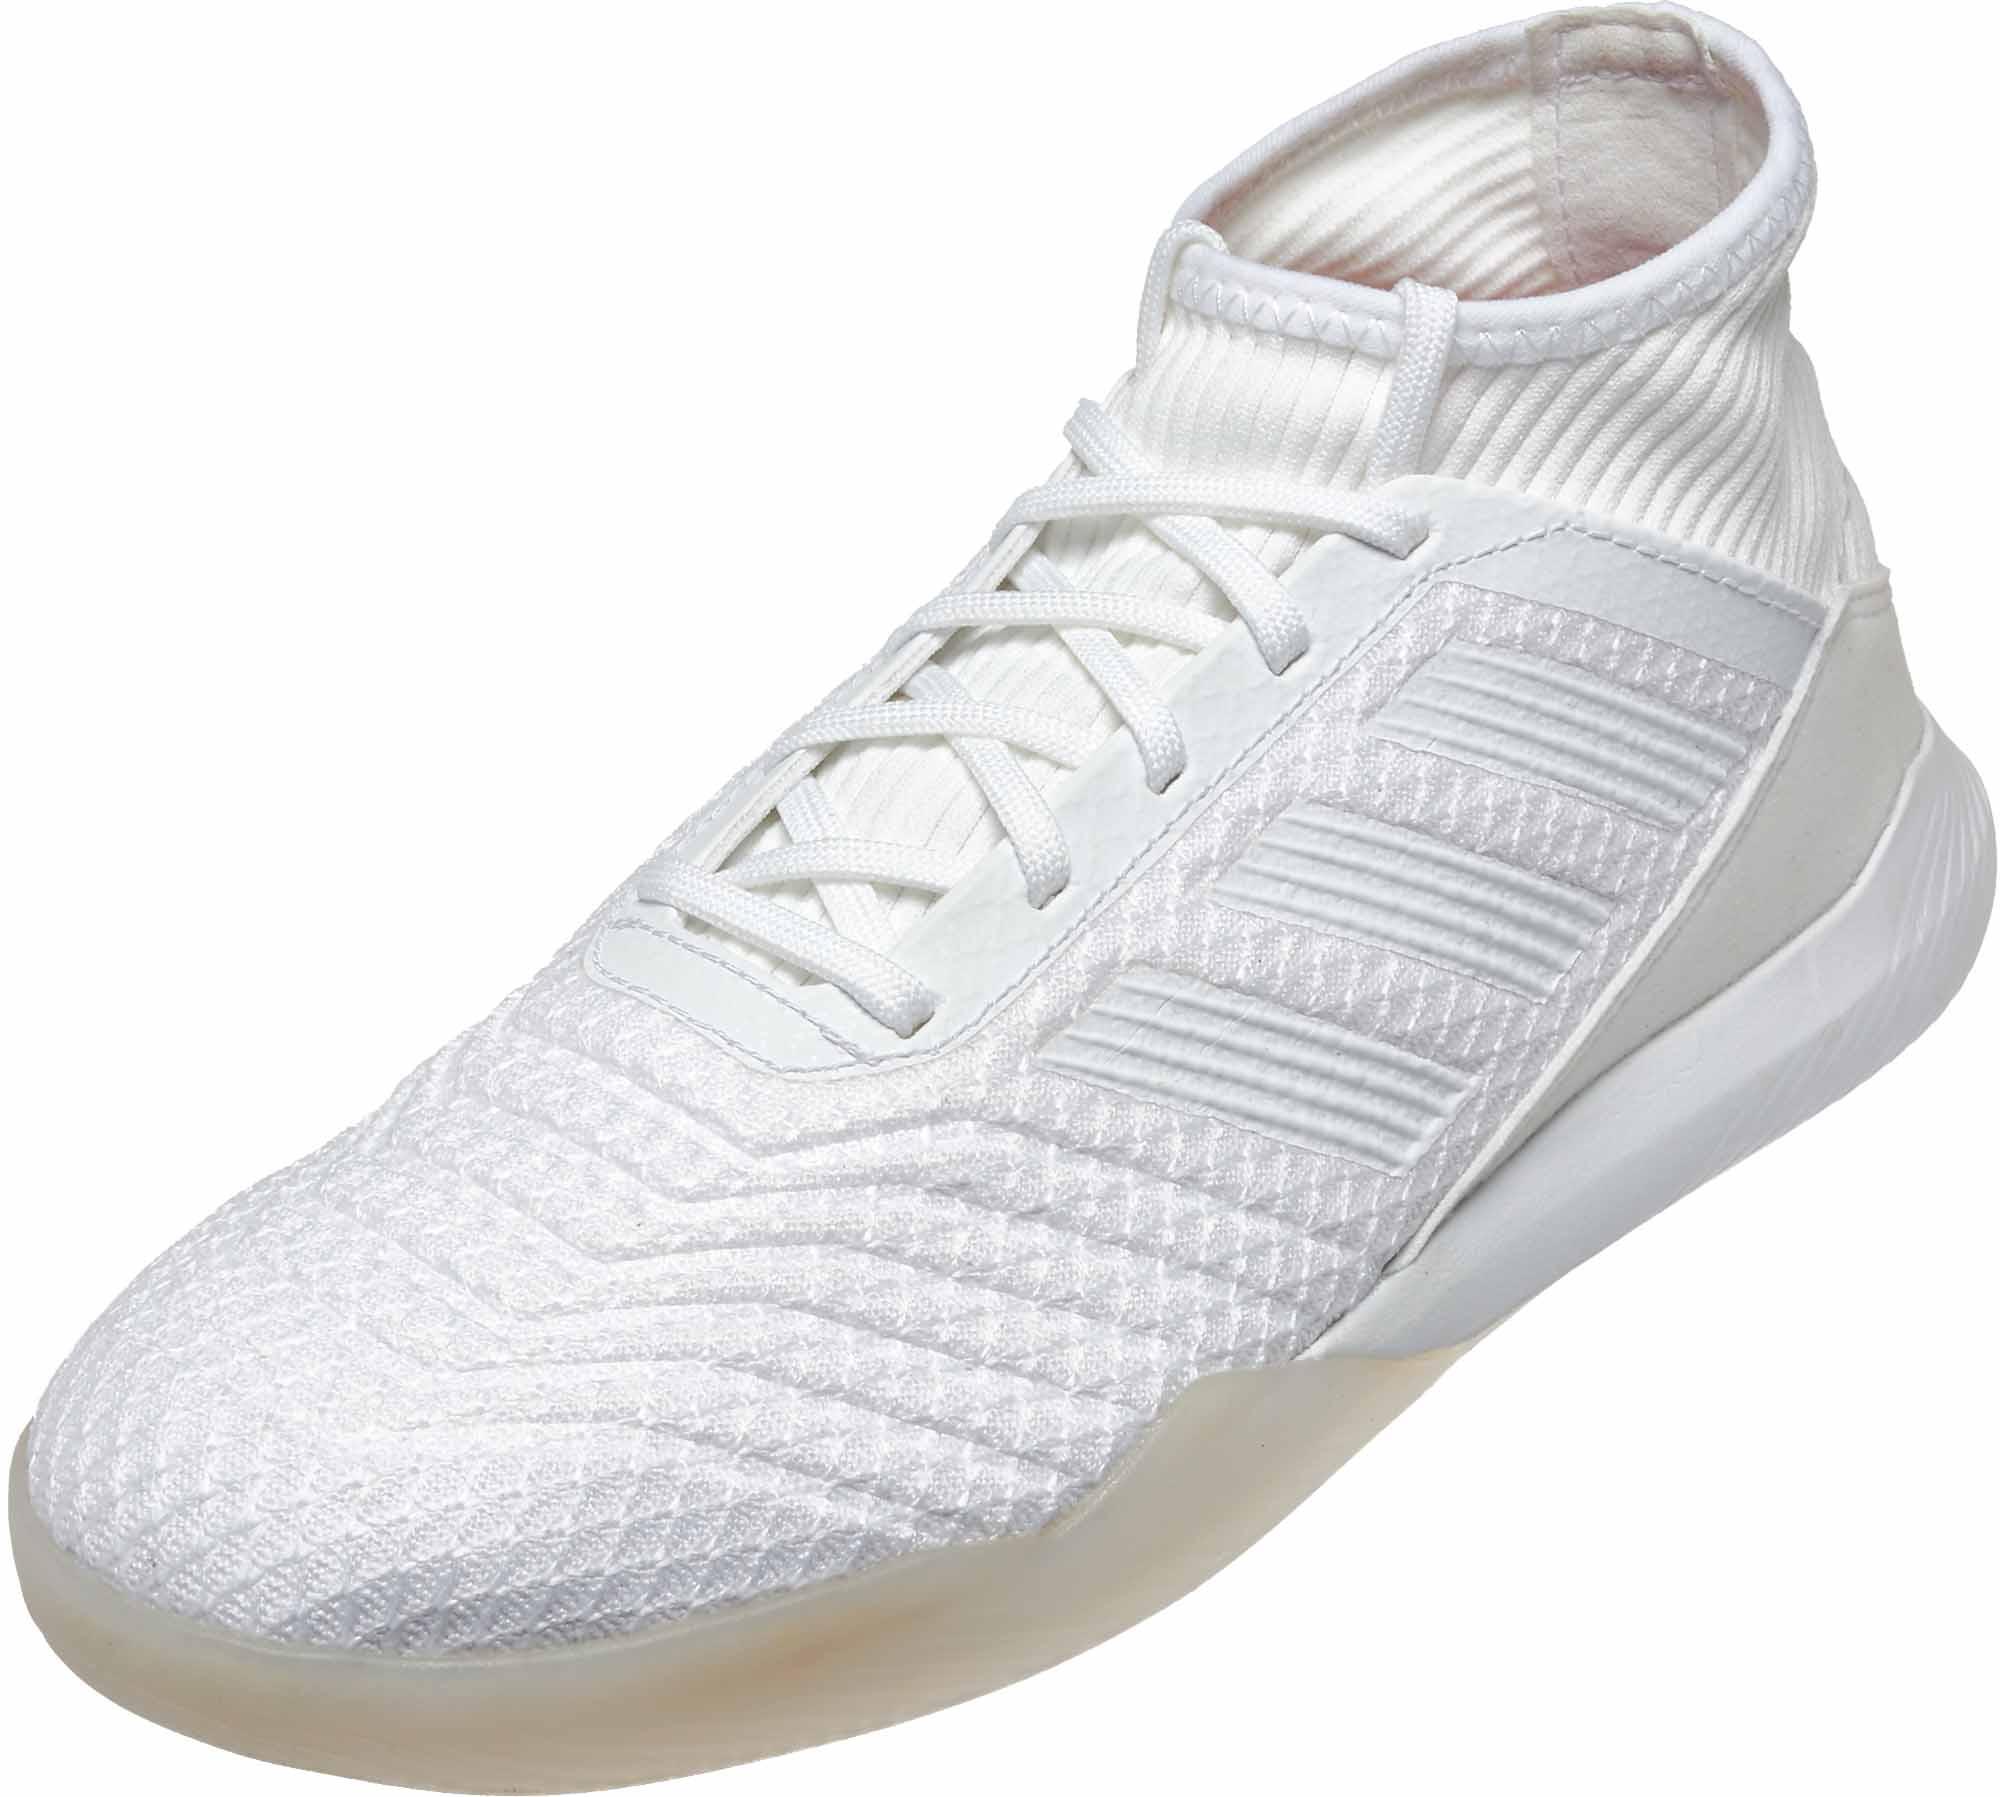 3f3e3d557618be adidas Predator Tango 18.3 TR - White Turf Soccer Shoes